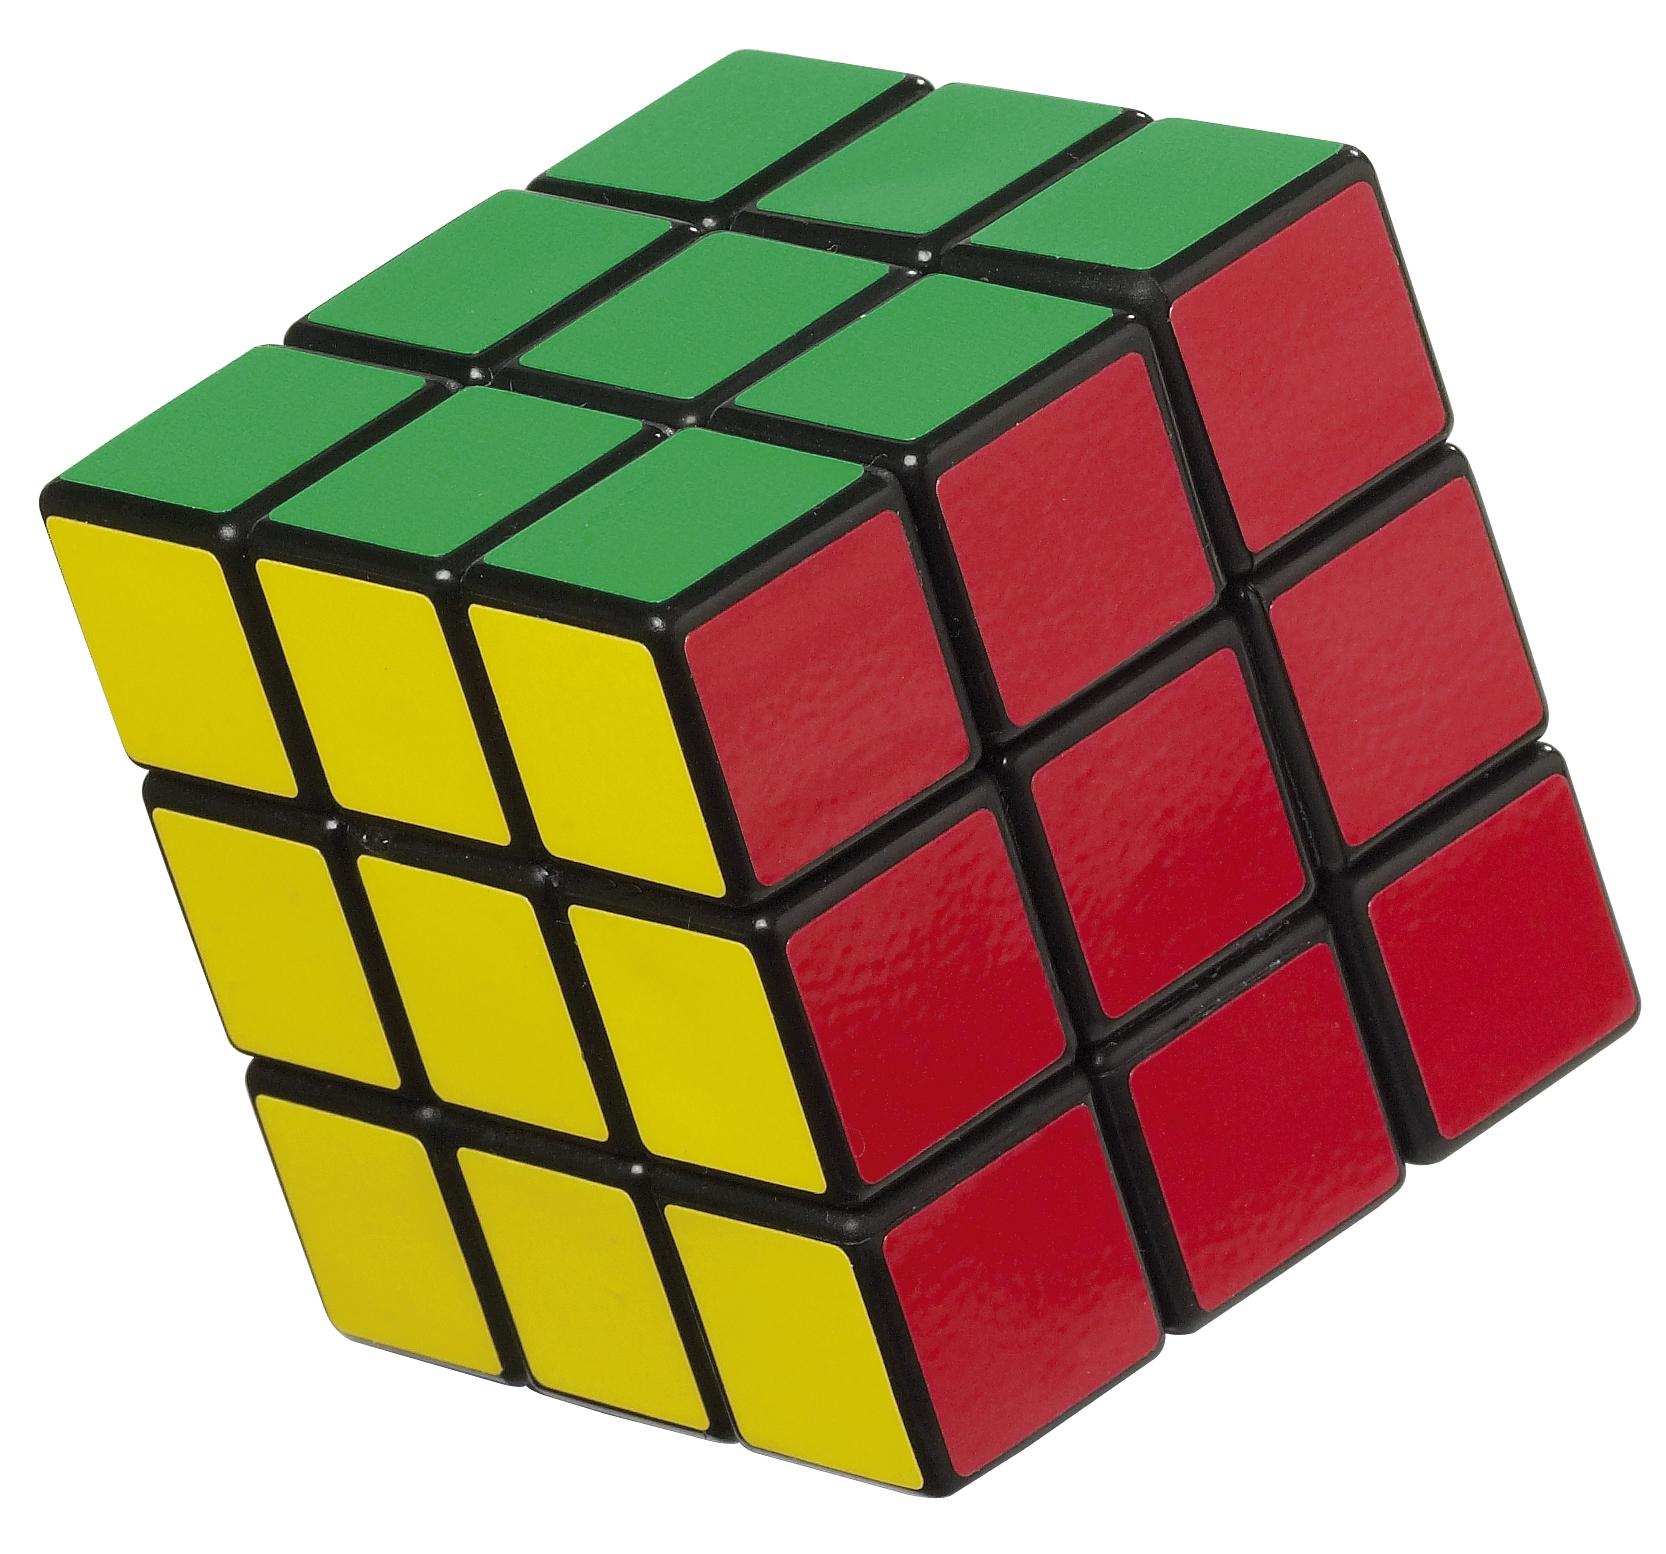 Colors Of A Rubik S Cube